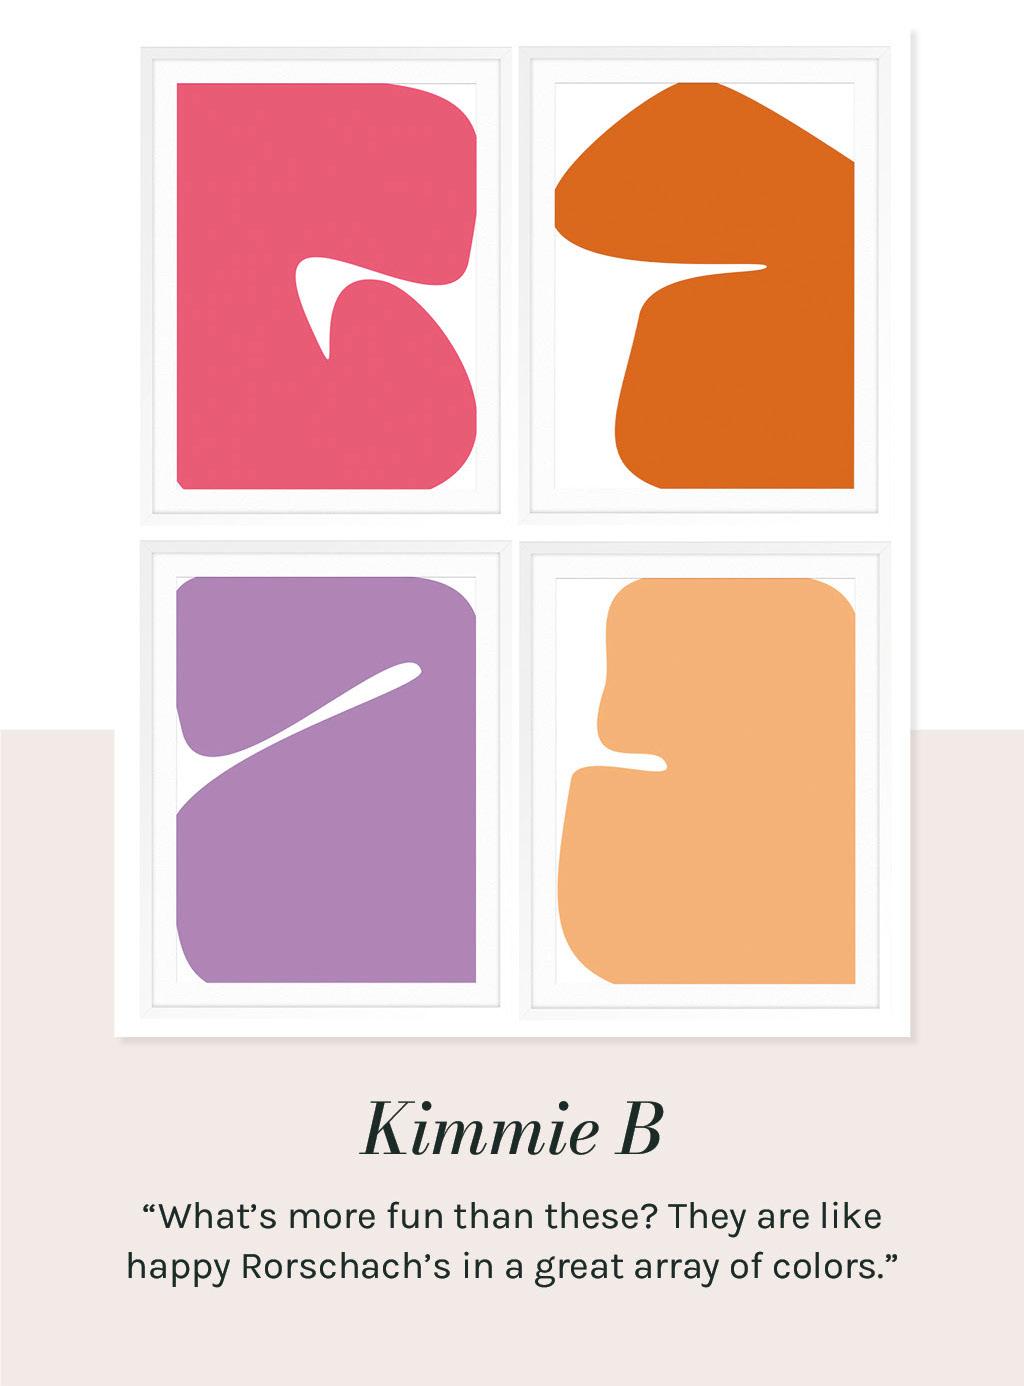 Kimmie B